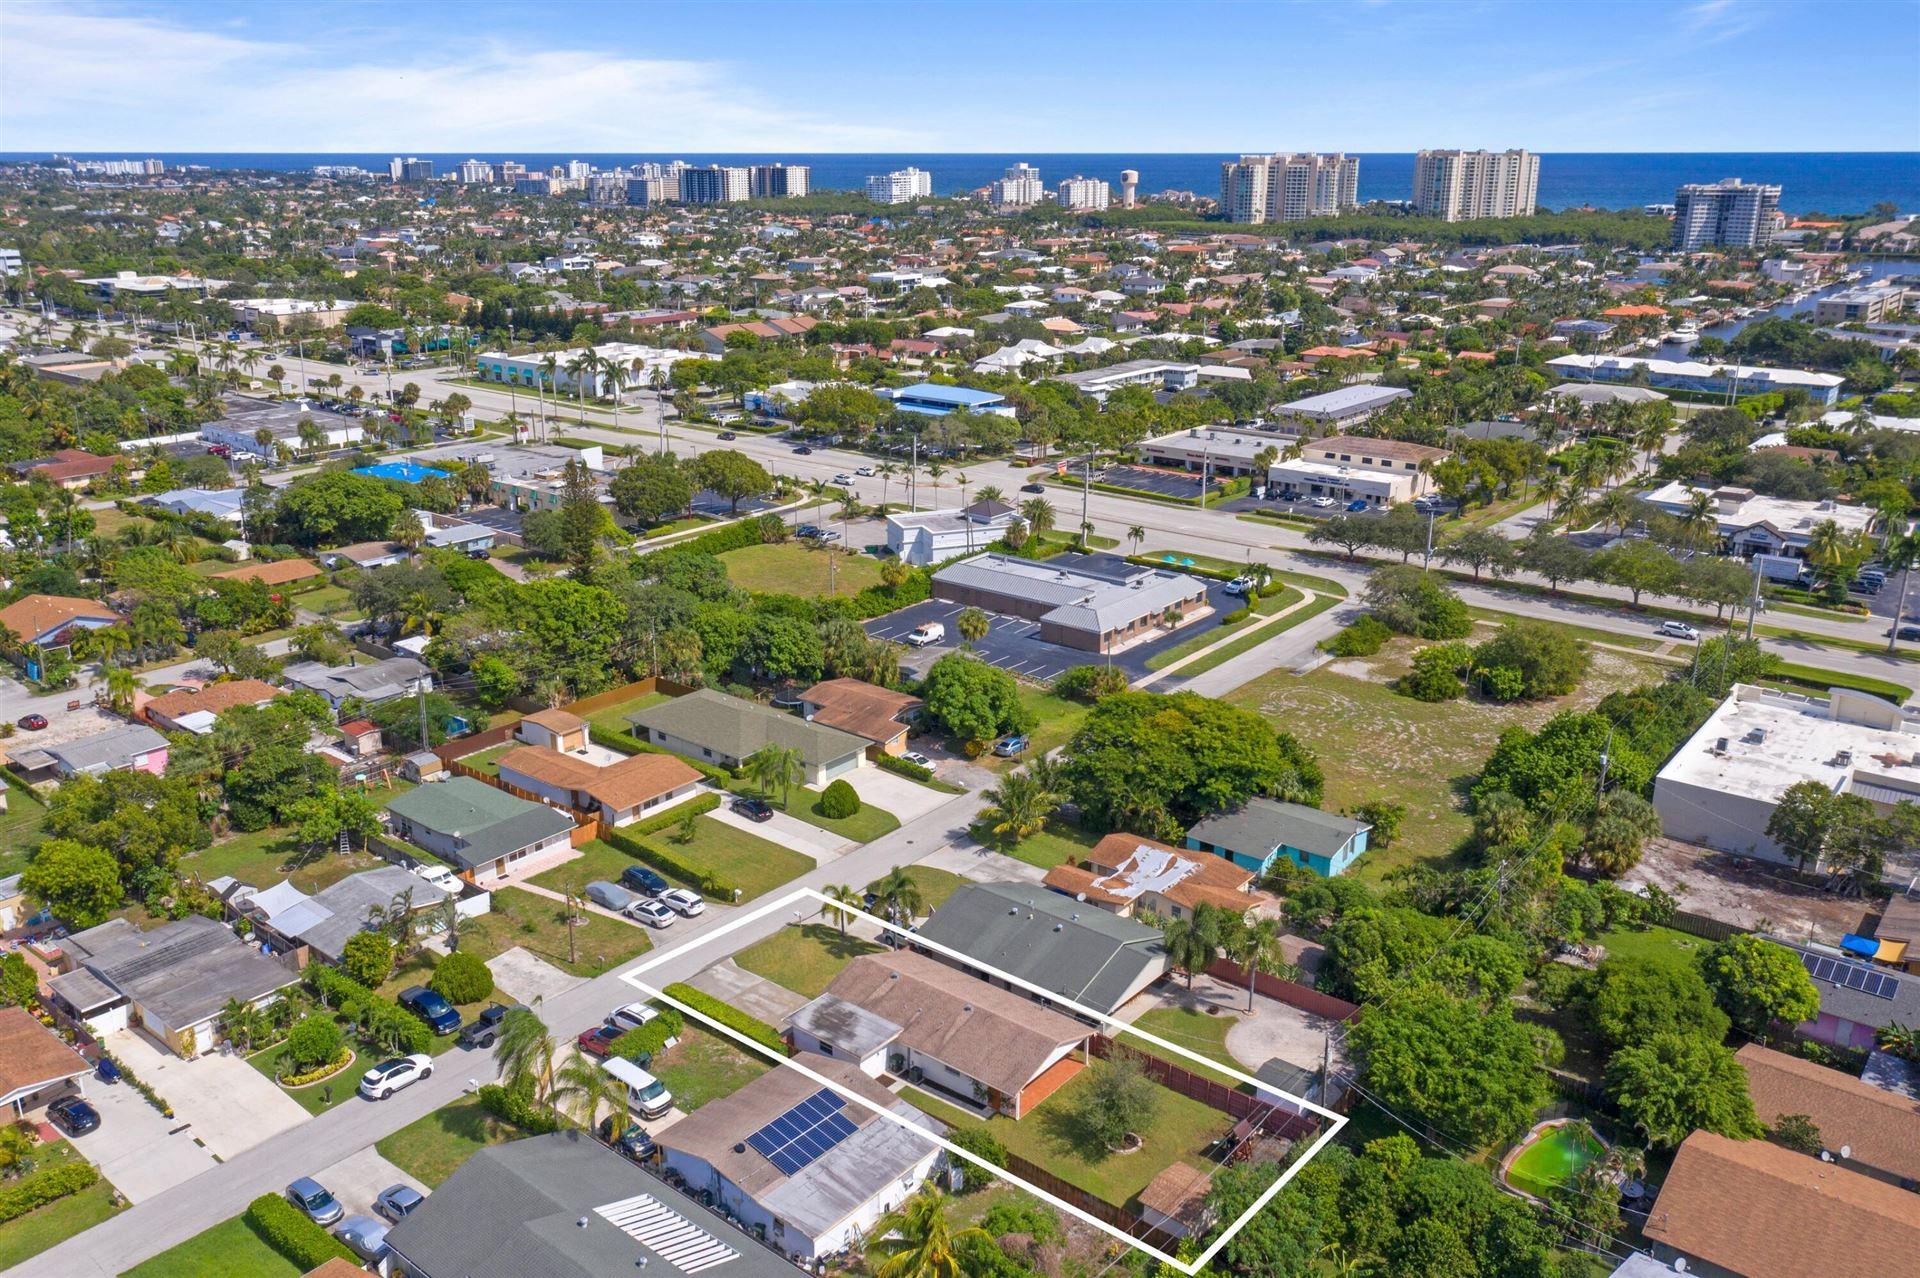 Photo of 382 Hastings Street, Boca Raton, FL 33487 (MLS # RX-10753669)